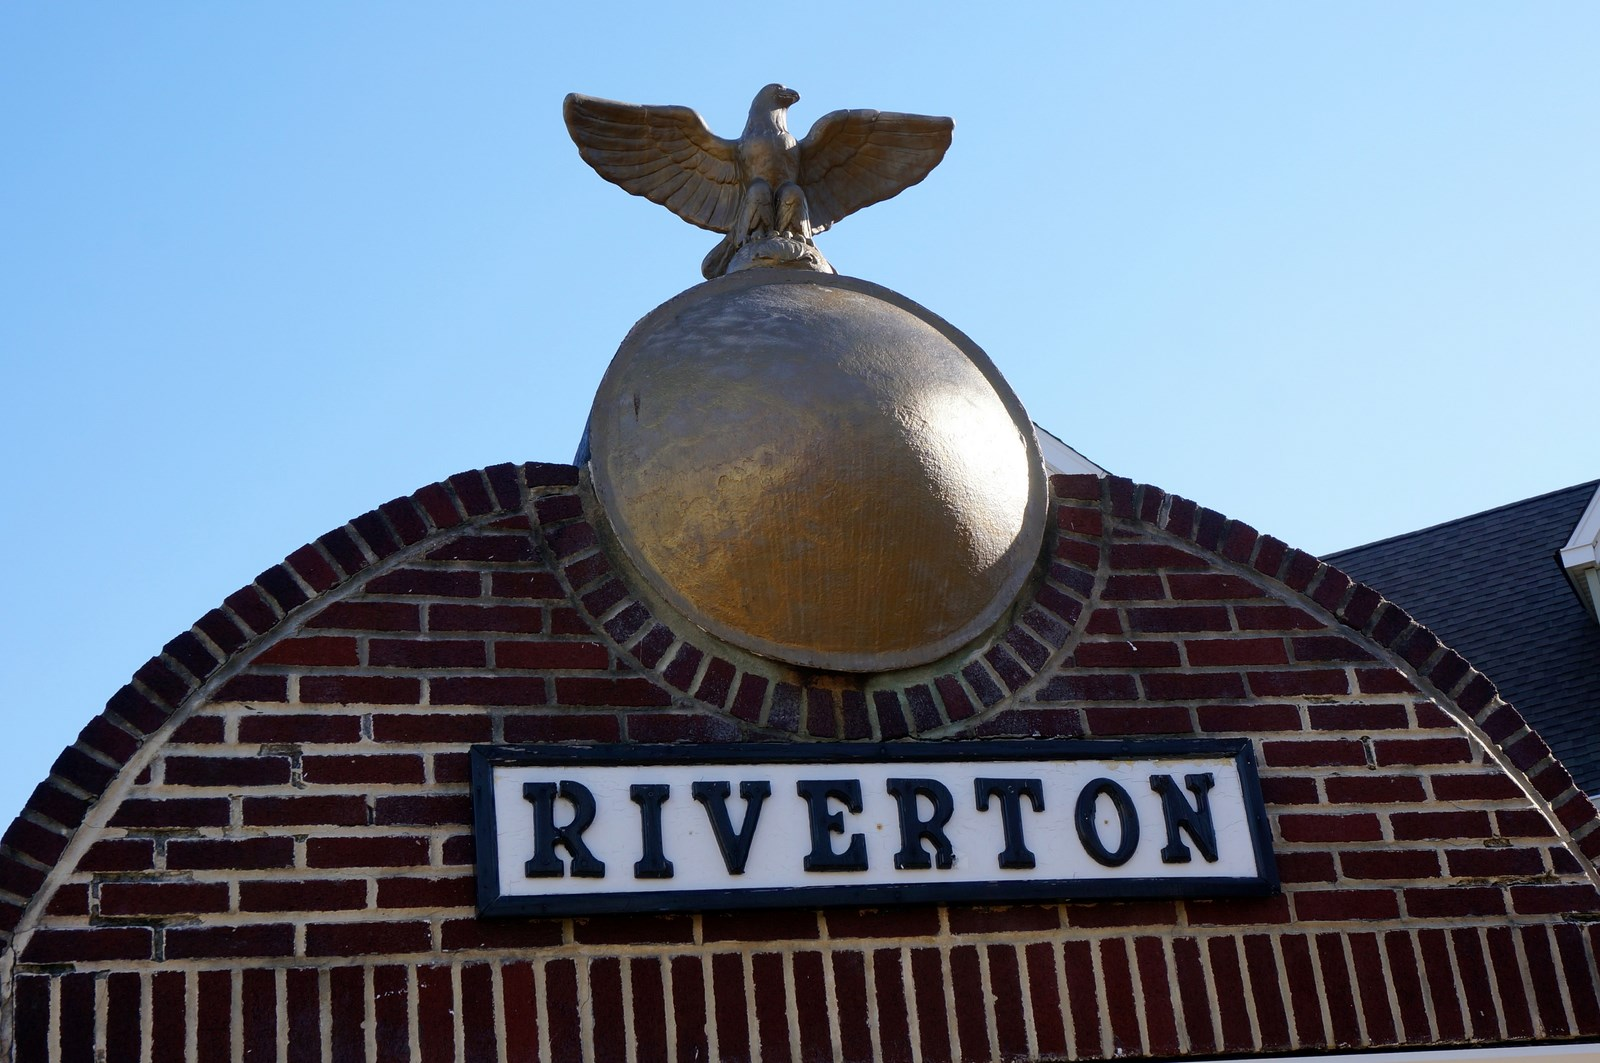 Riverton veterans historical society of riverton nj for The riverton